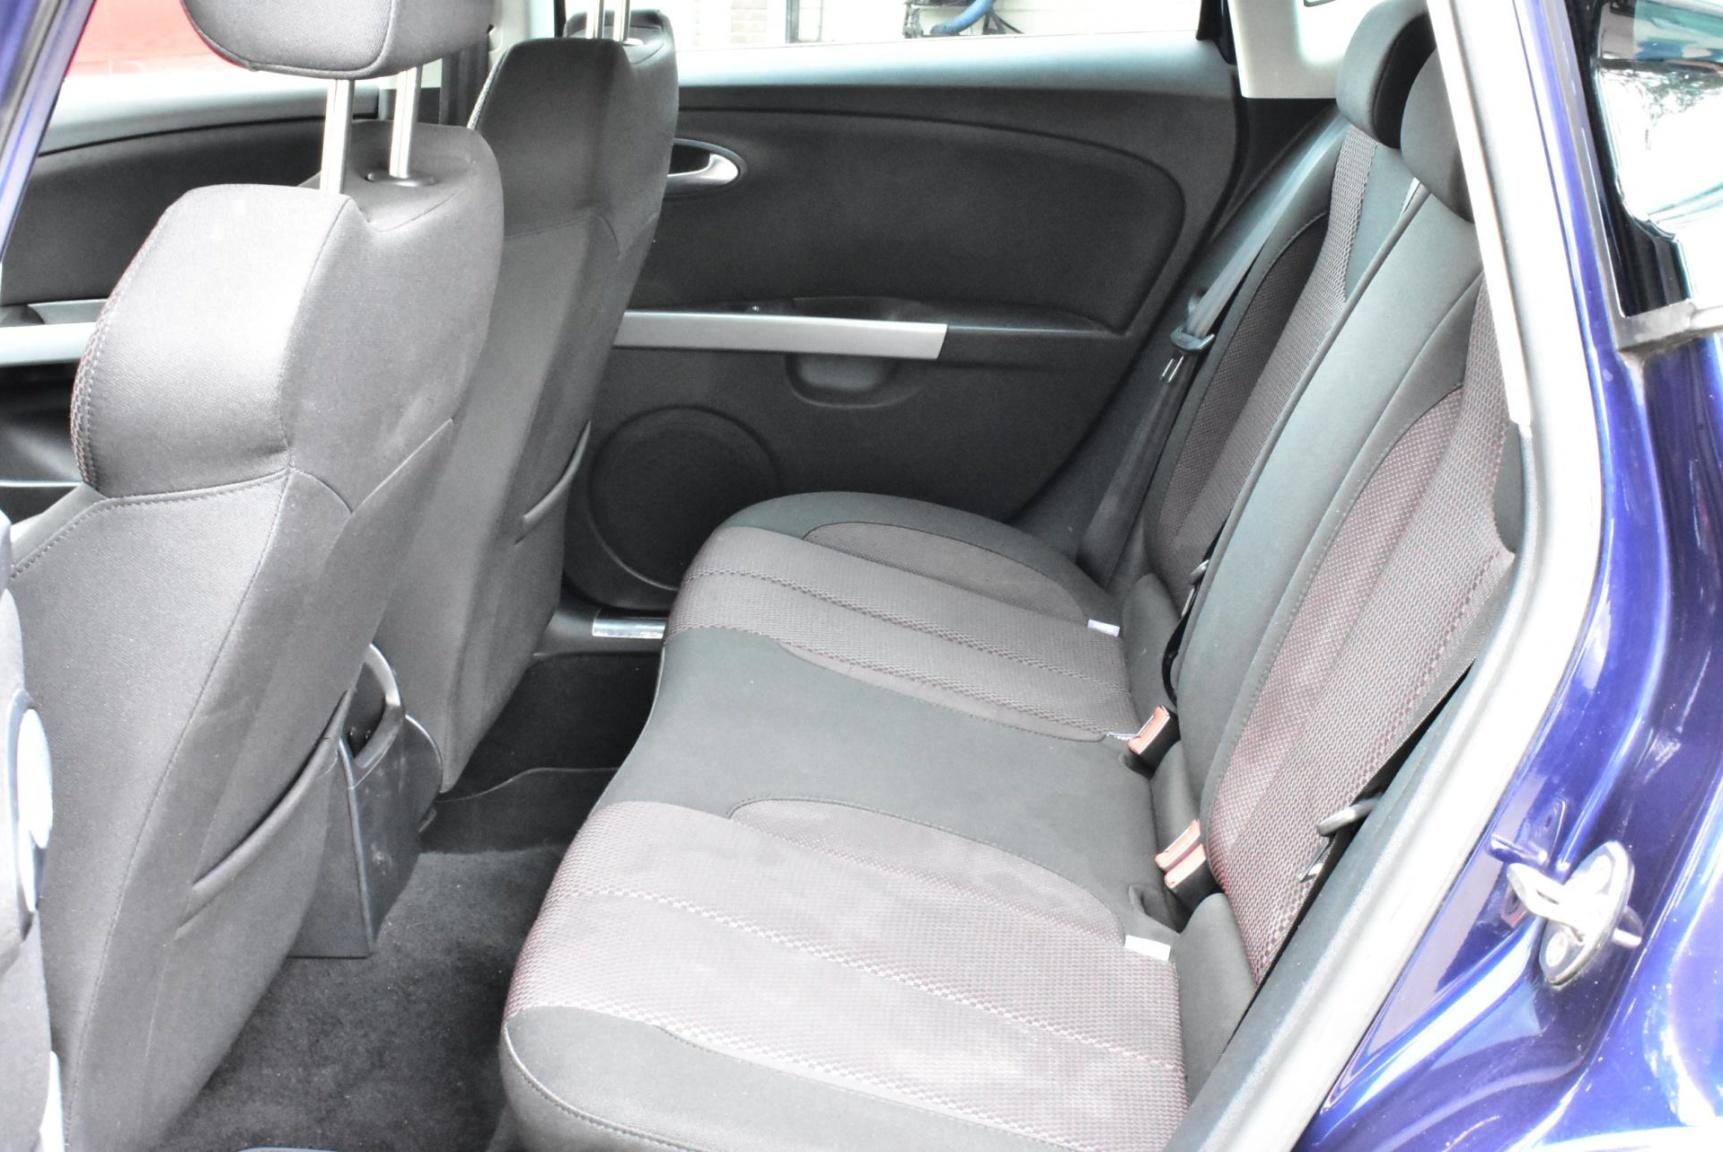 SEAT-Leon-11